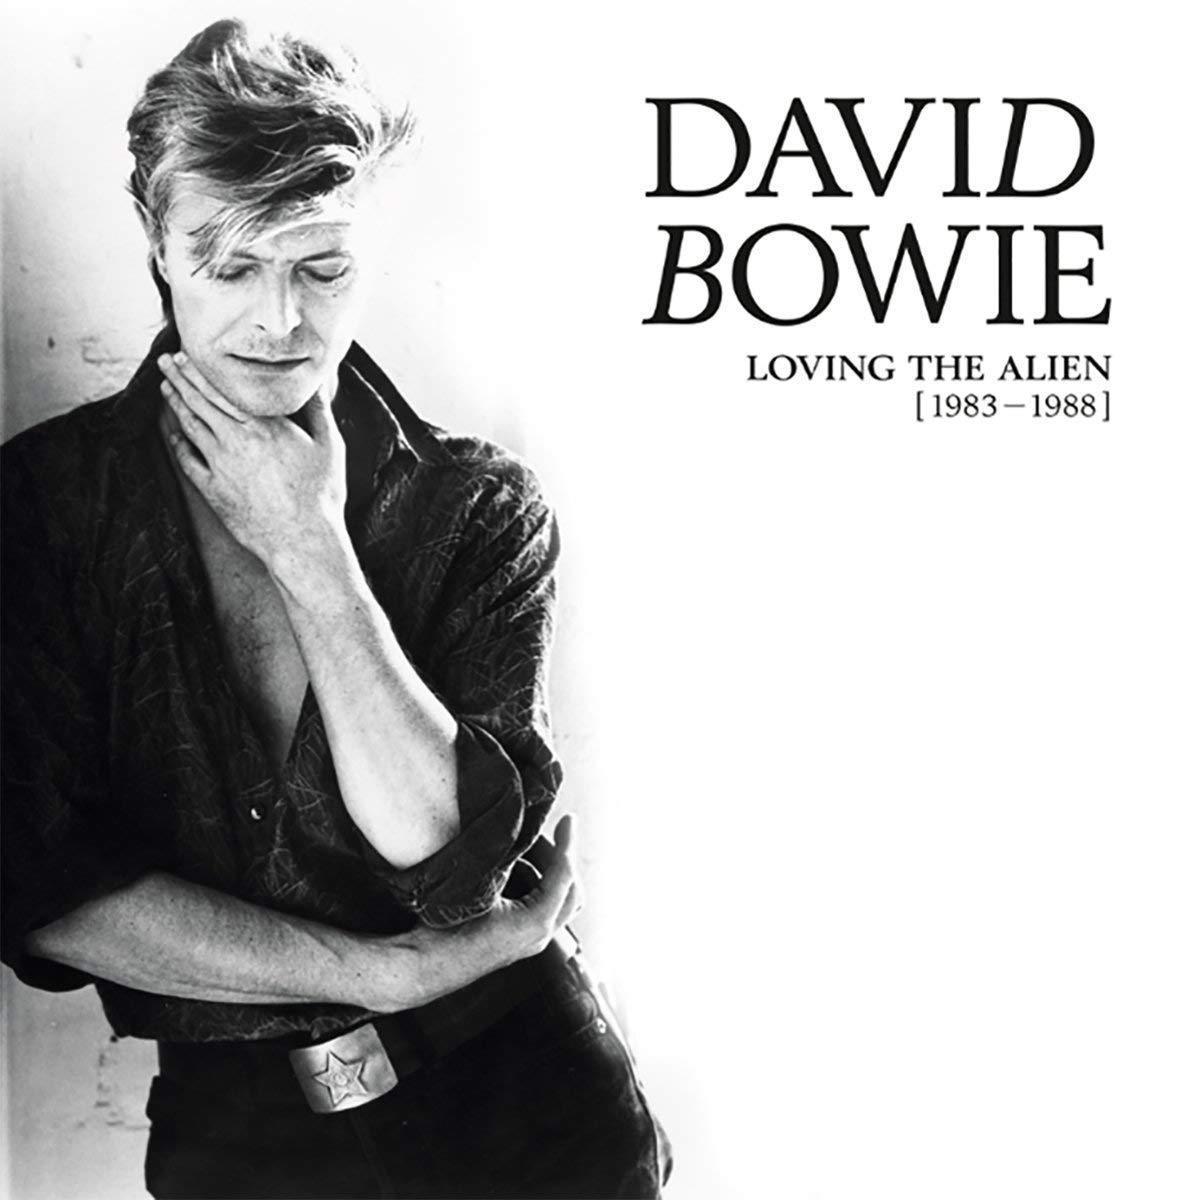 DAVID BOWIE 'LOVING THE ALIEN (1983 - 1988)' (Pre Order VINYL Box Set)